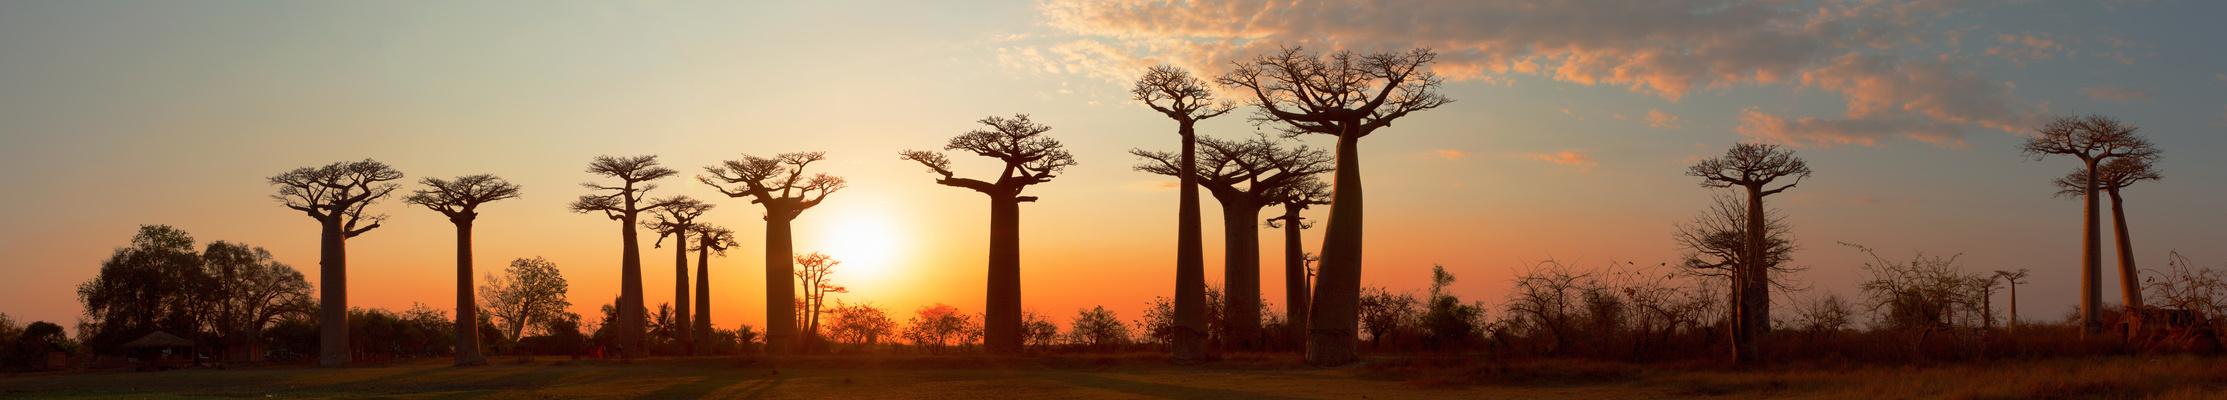 Baobab Allee-Panorama